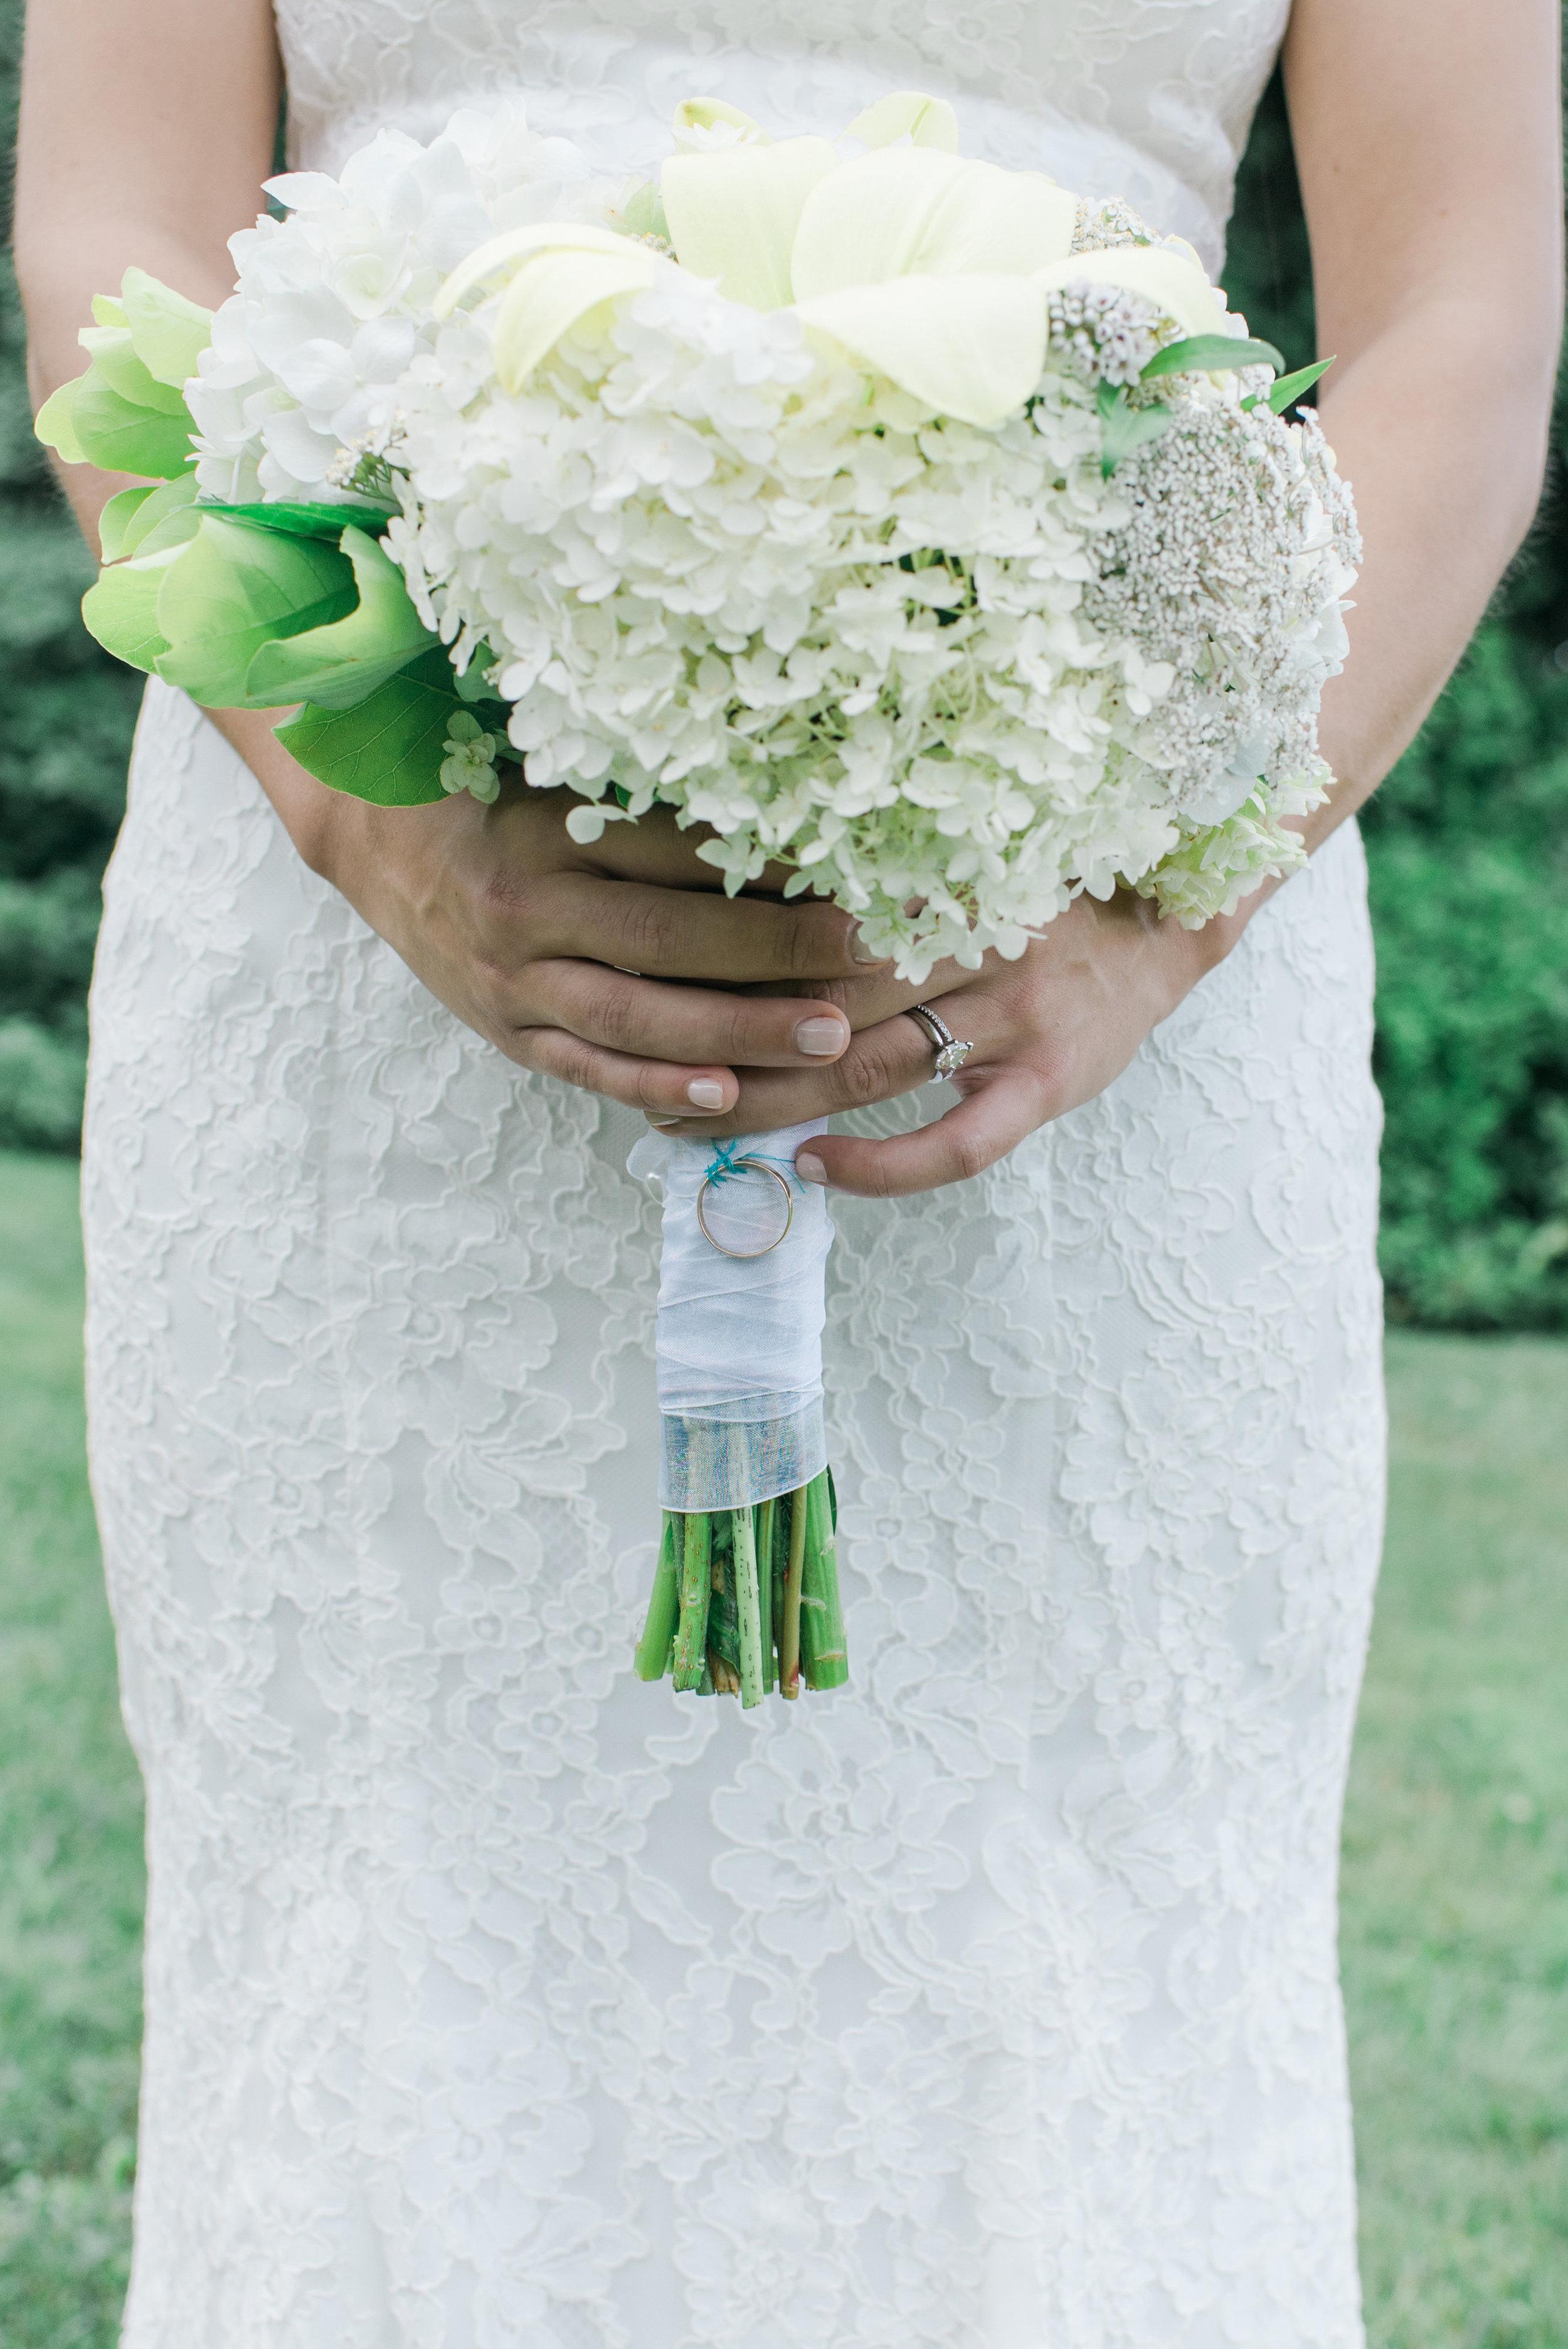 062715-Hannah+Drew-pharsalia-wedding-kathryn-ivy-photography-95.jpg